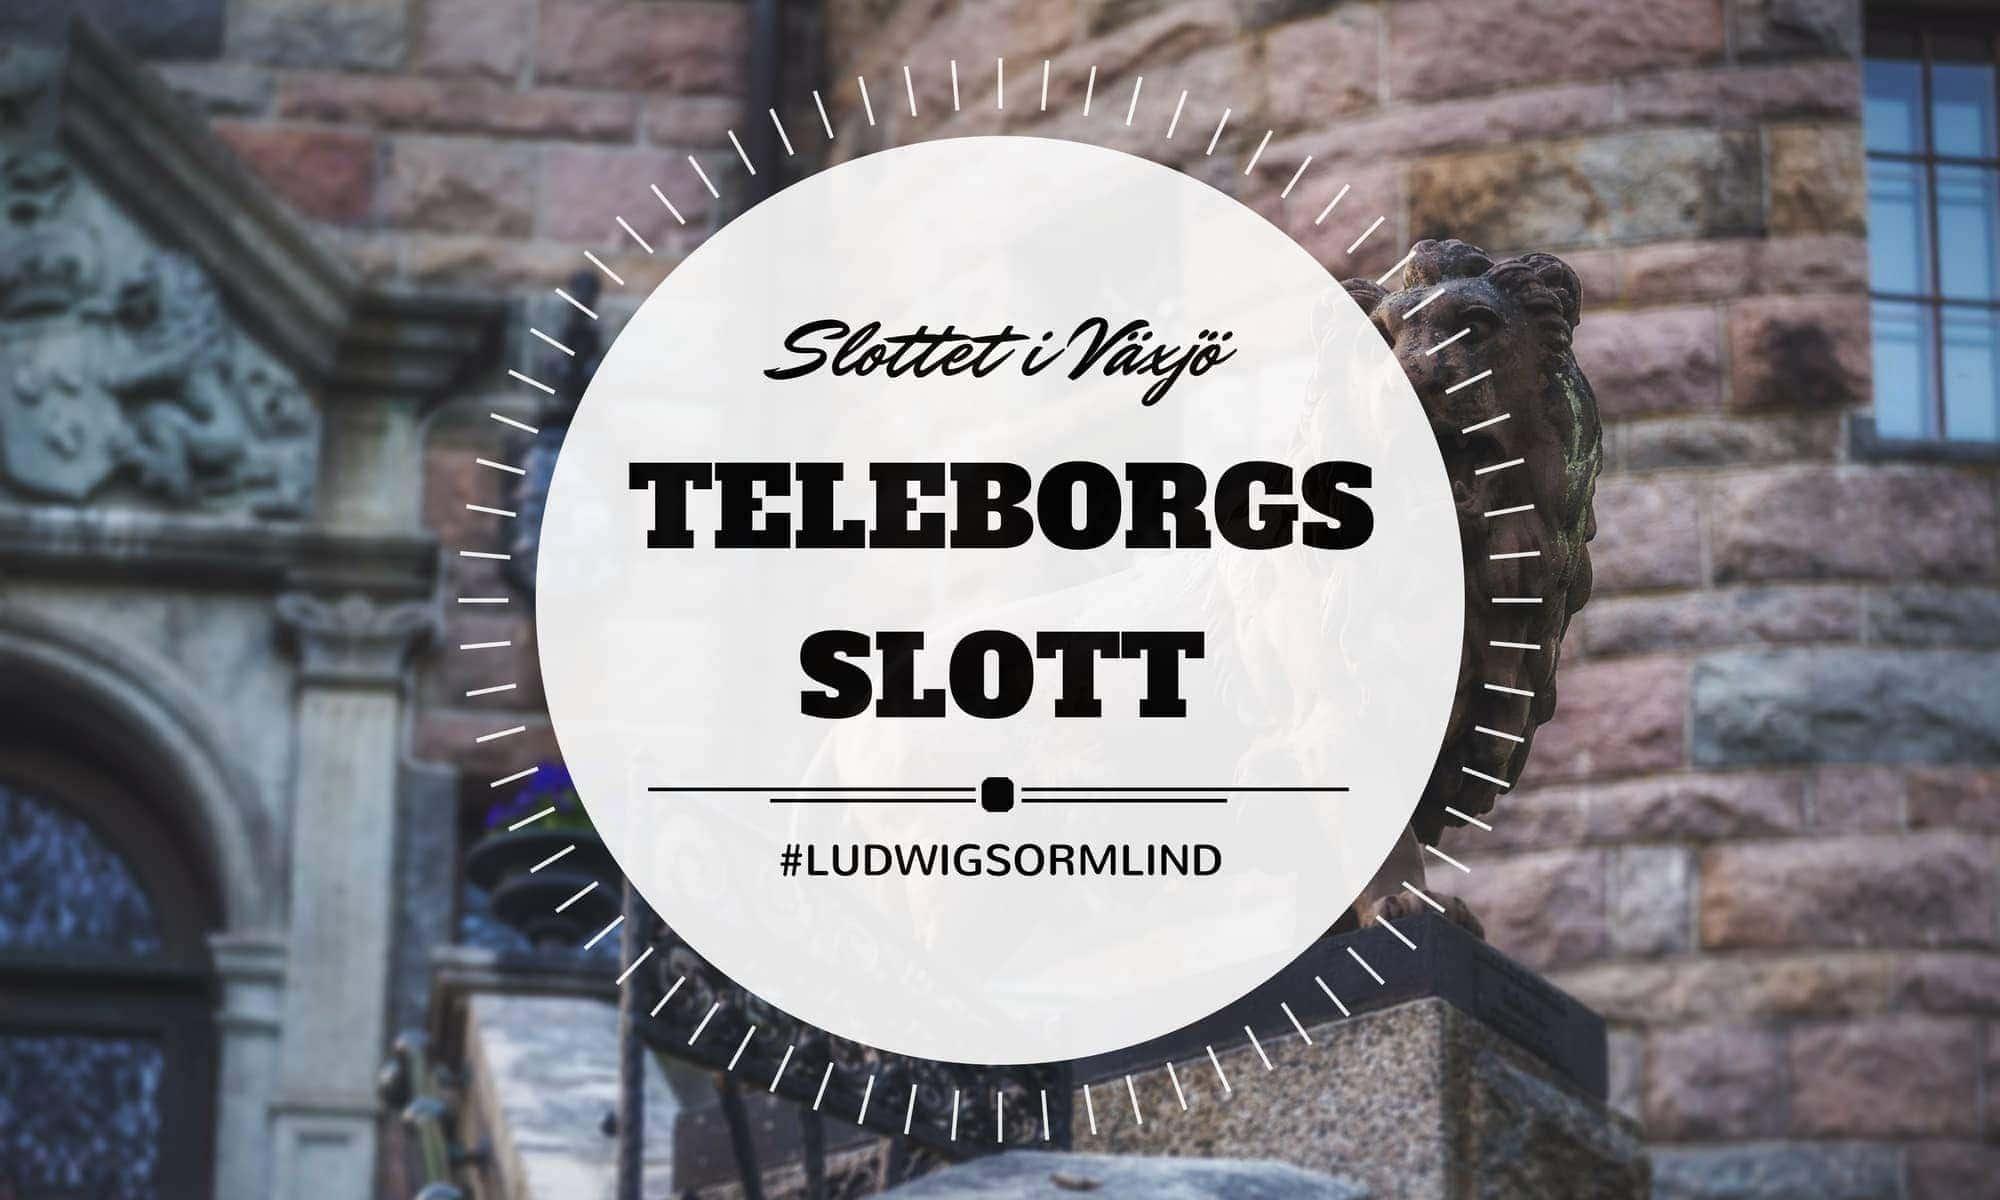 Teleborgs Slott - Slottet i Växjö - Ludwig Sörmlind